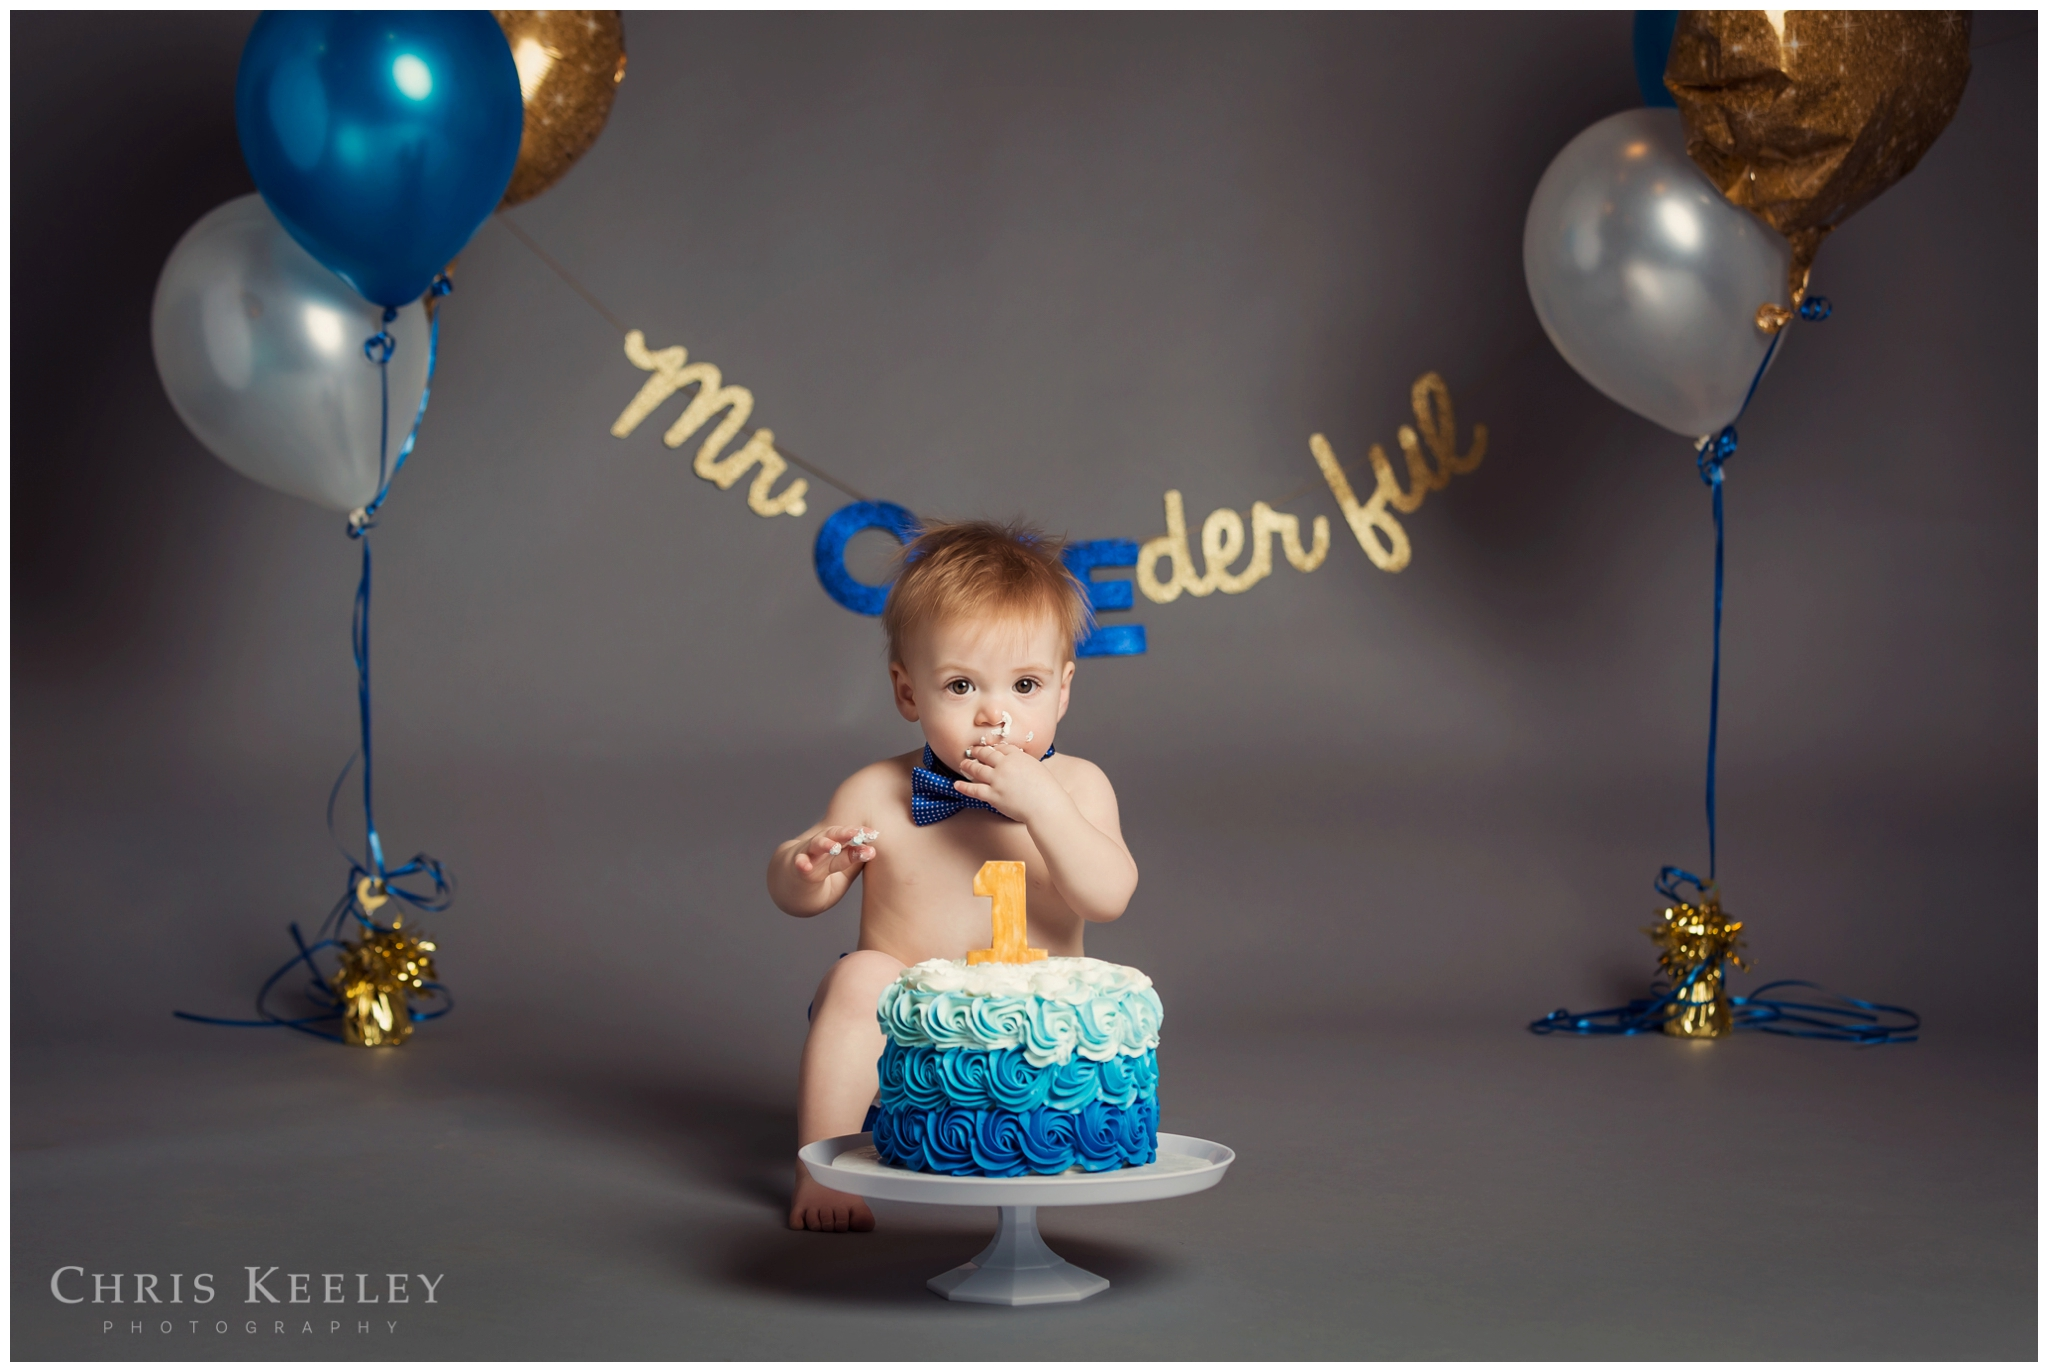 cake-smash-family-photographer-dover-new-hampshire-04.jpg